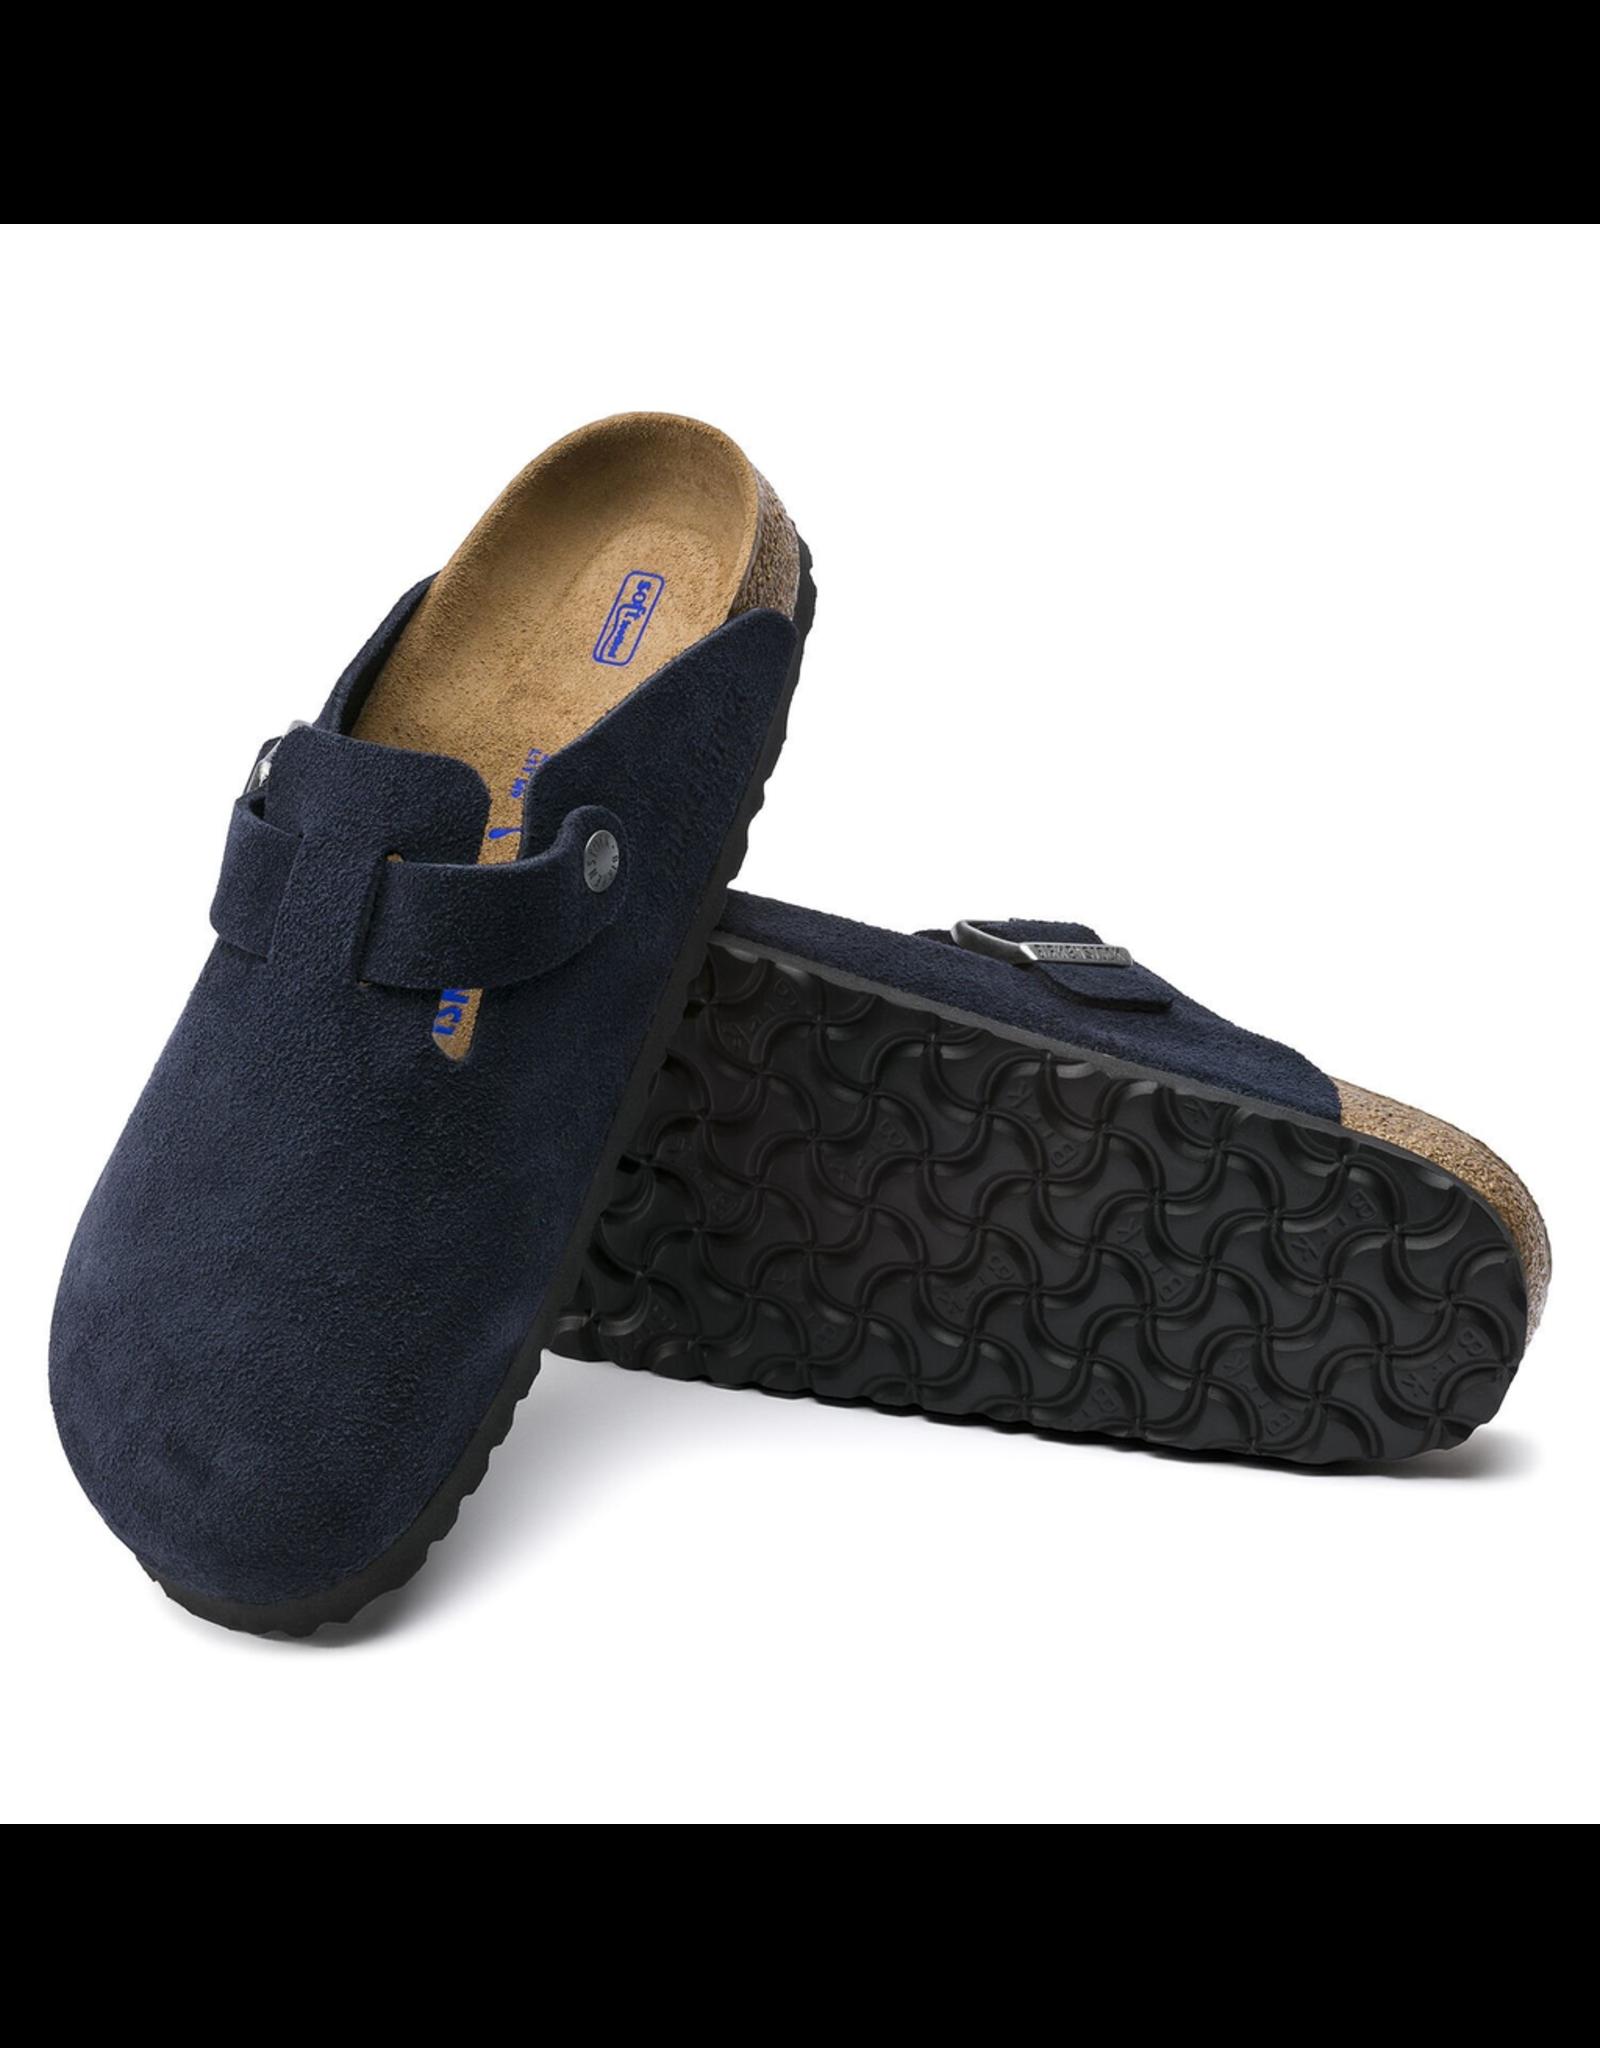 Birkenstock Boston Clog Suede Soft Footbed